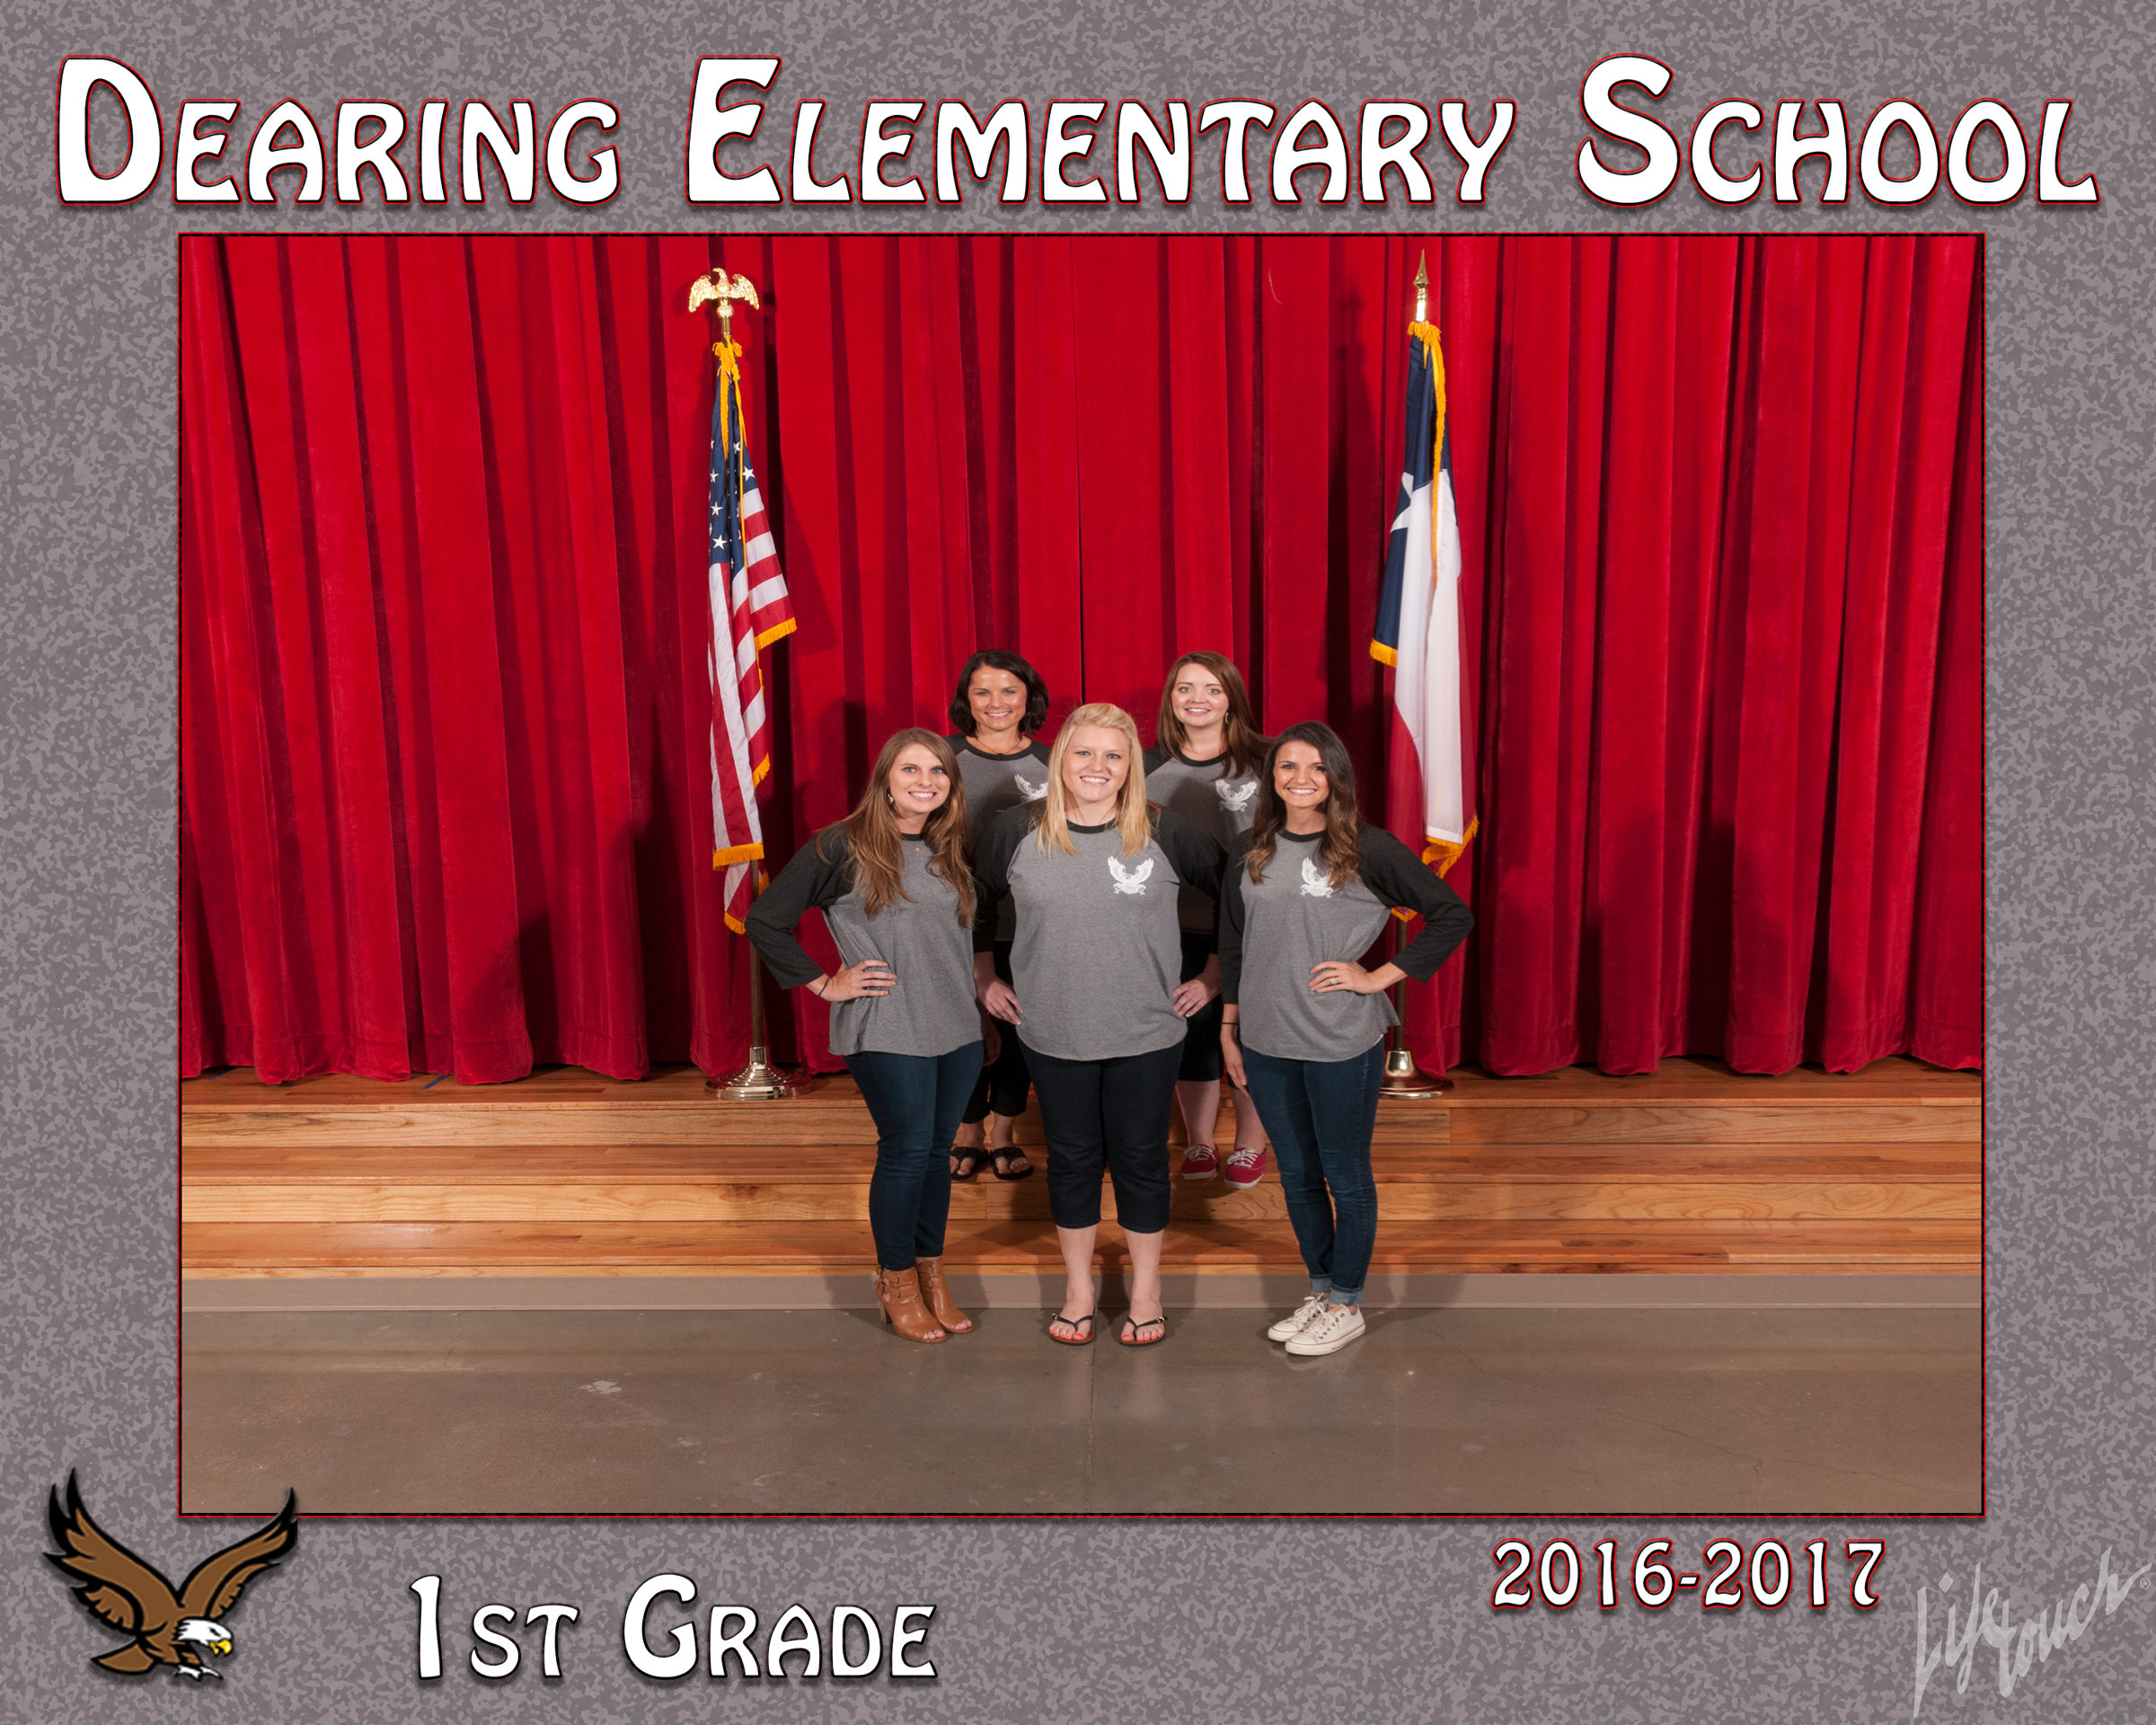 dearing elementary staff    staff photos